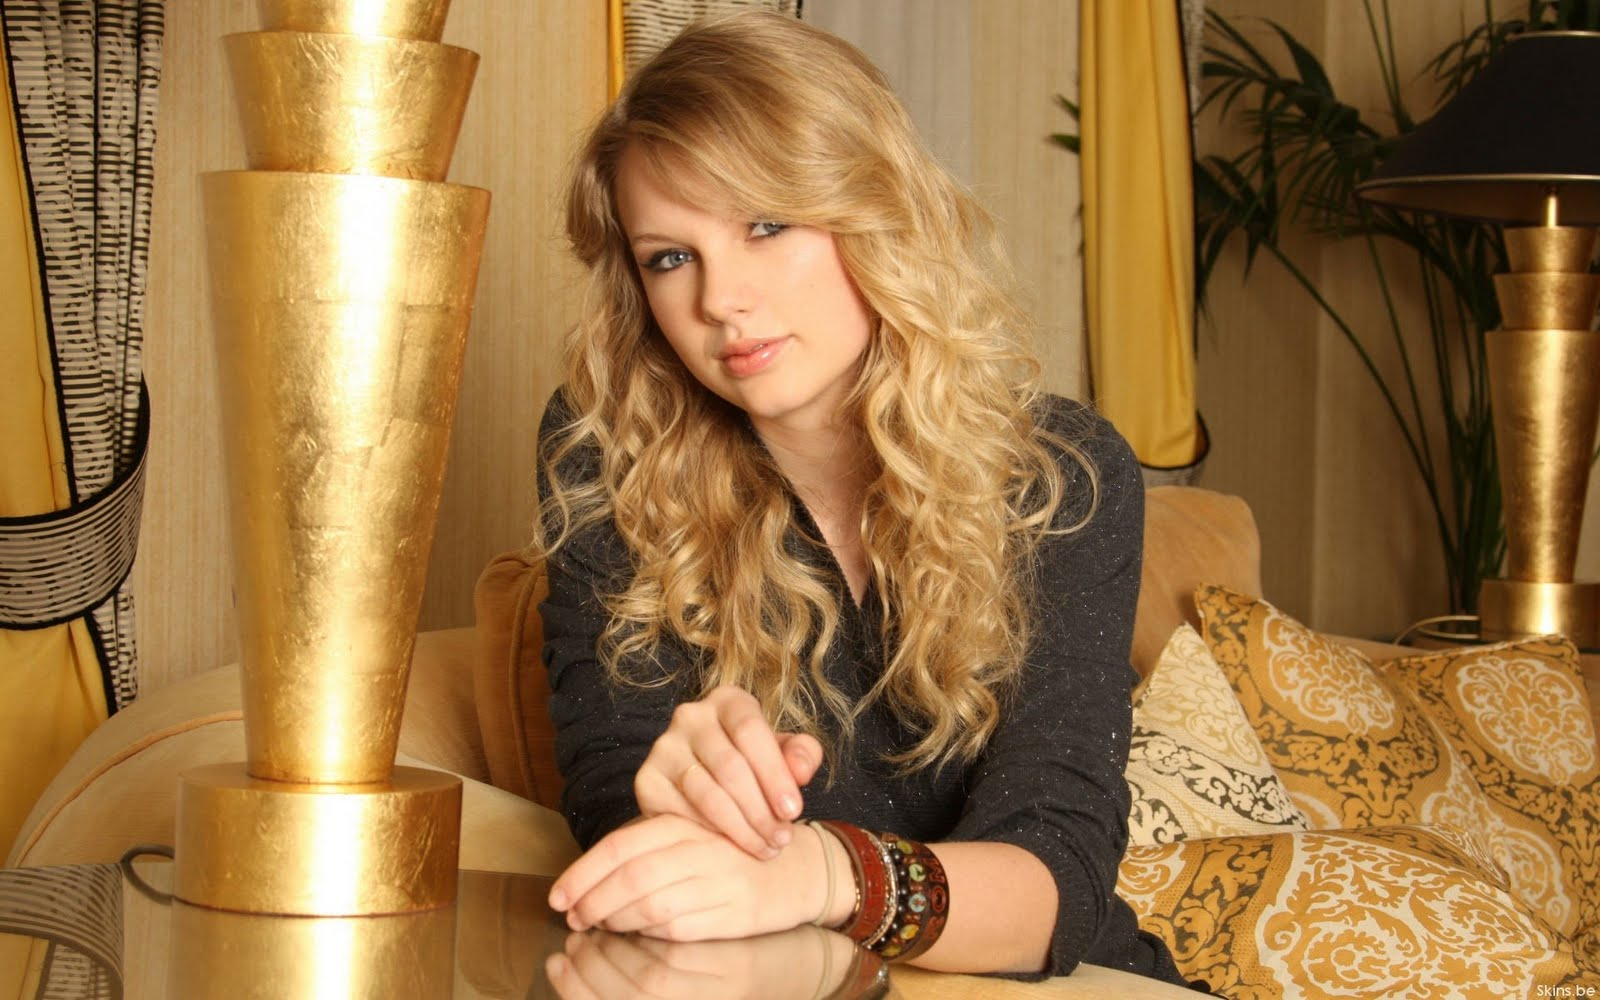 http://3.bp.blogspot.com/_aFE_uiSdmcU/SxNjFrO7IJI/AAAAAAAAASE/Om_WQXyEFeU/s1600/Taylor+Swift+(41).jpg